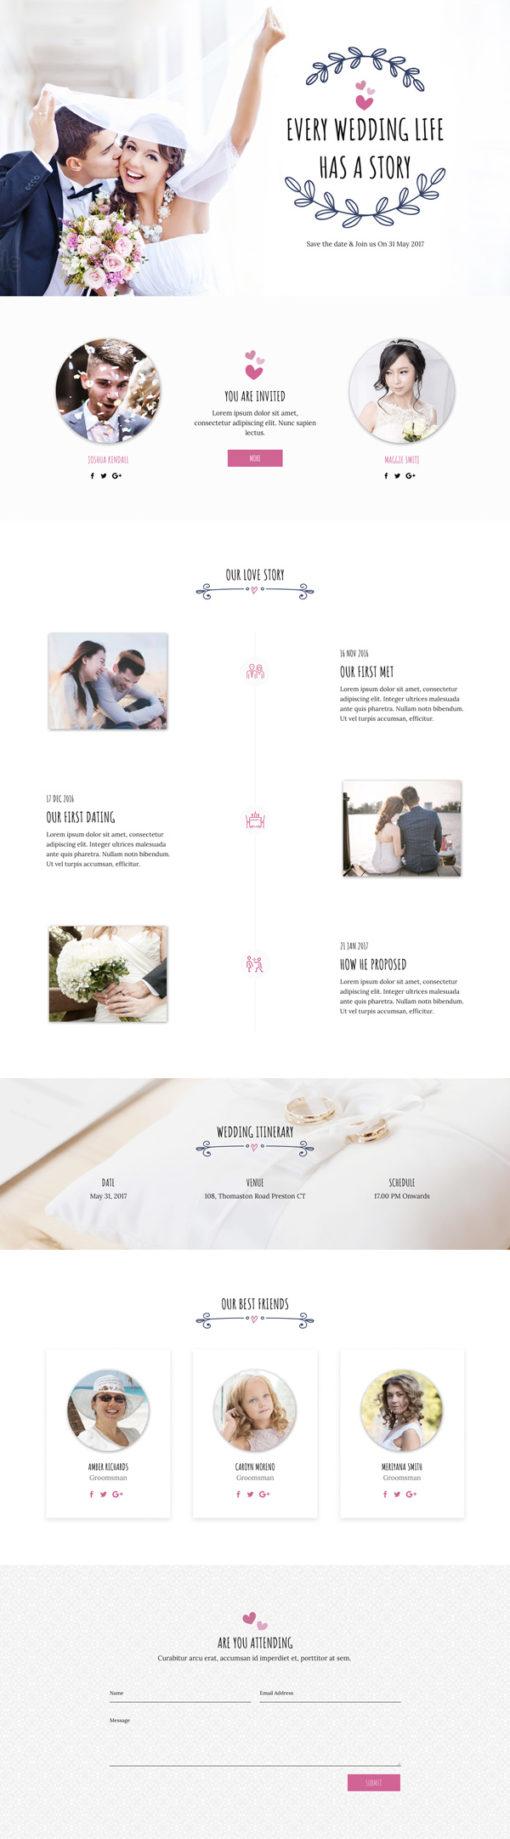 Divi layout for wedding invite